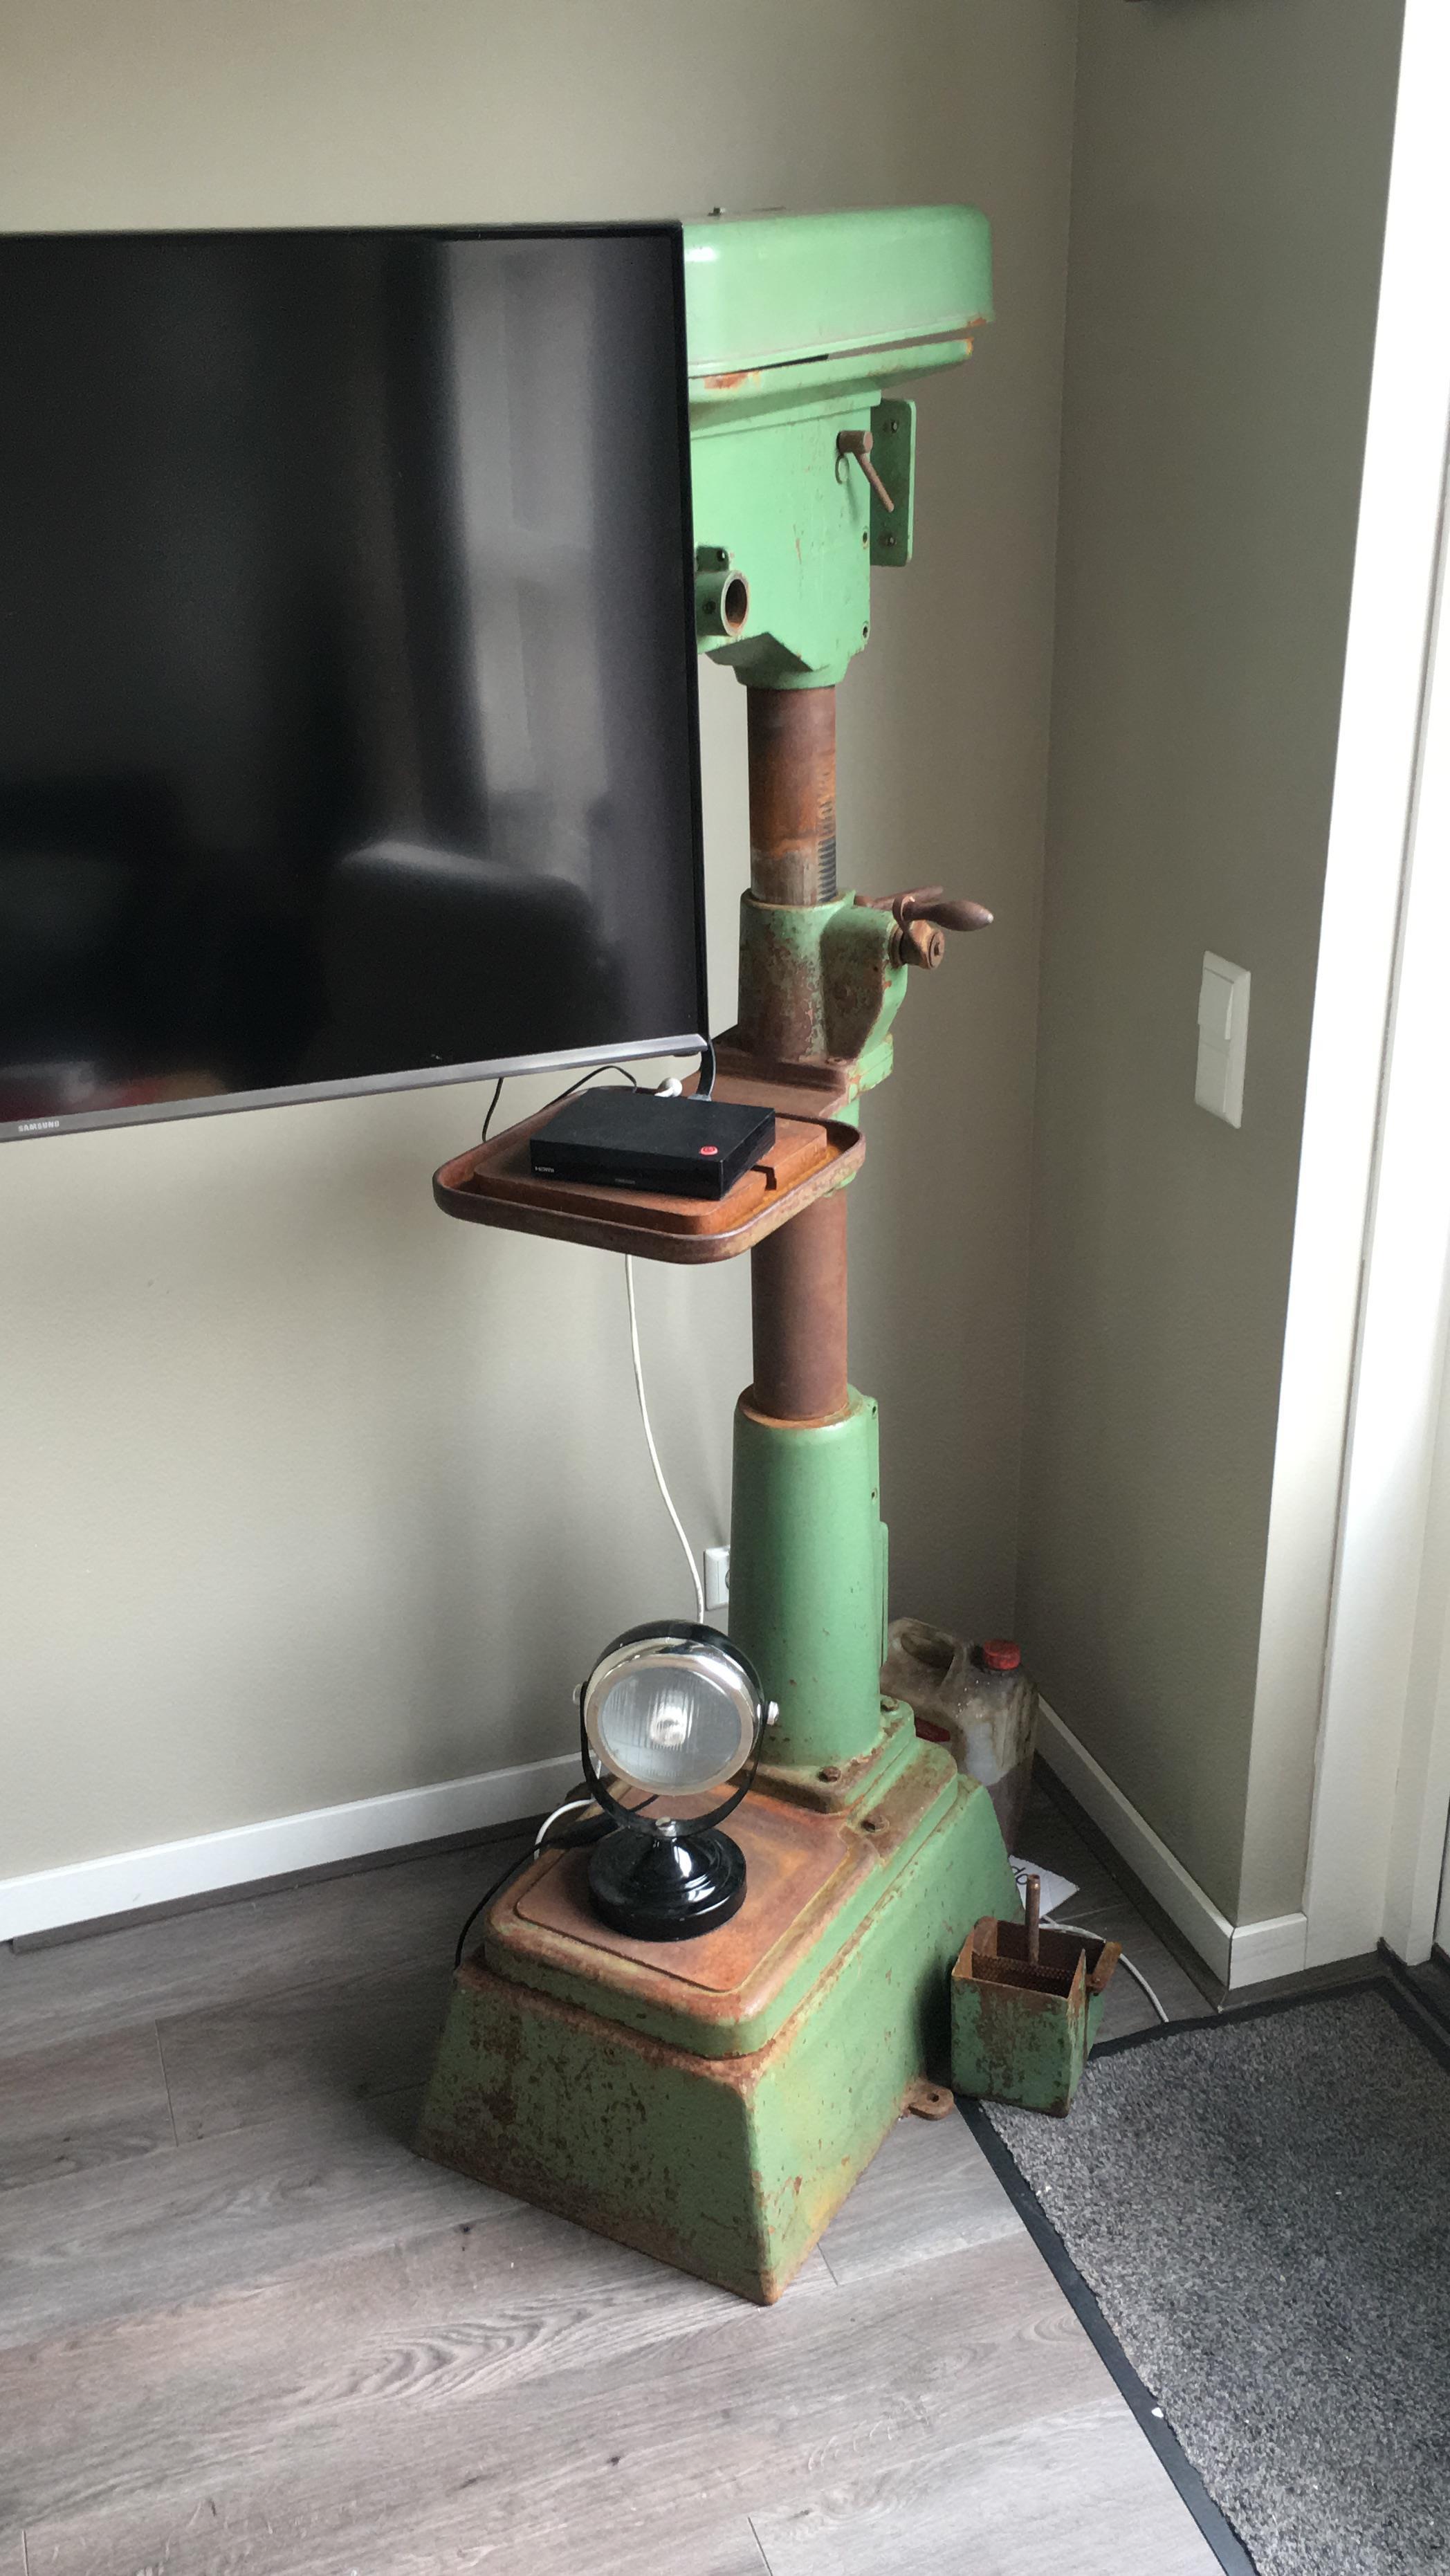 Upcycle industrëel vintage TV-meubel van oude